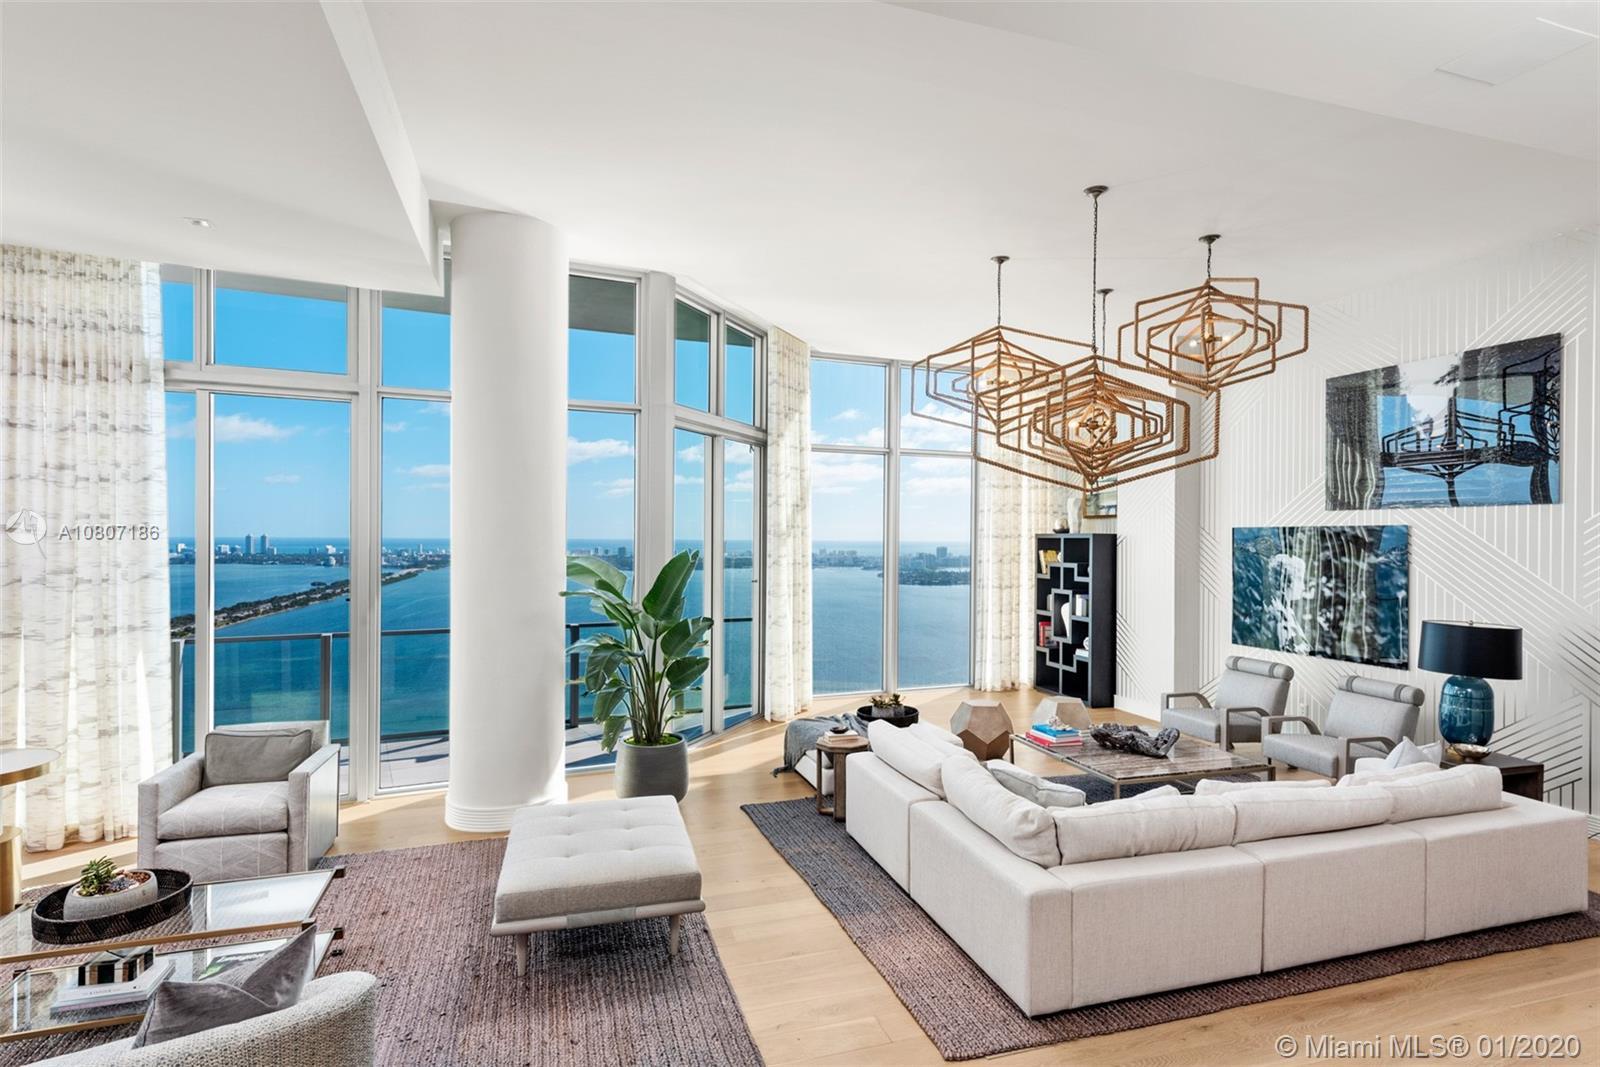 2900 NE 7th Ave, Unit #5101 Luxury Real Estate